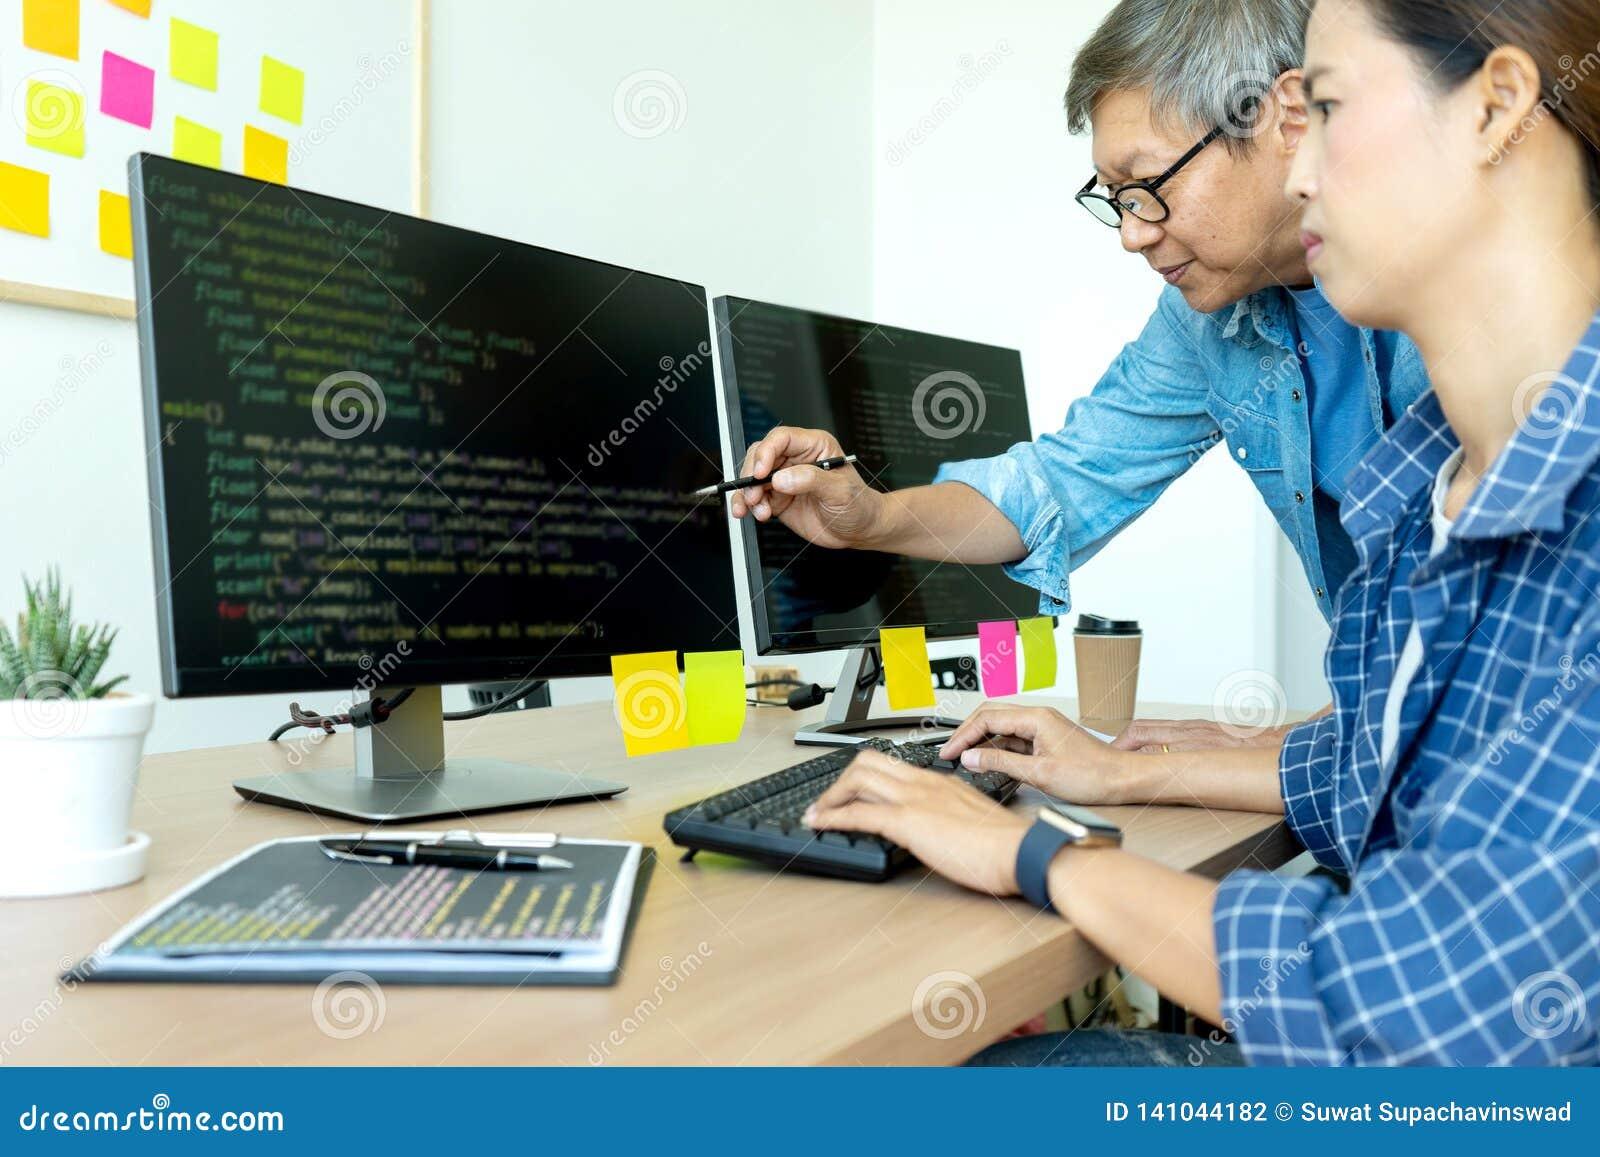 senior programmer work with Developing programming